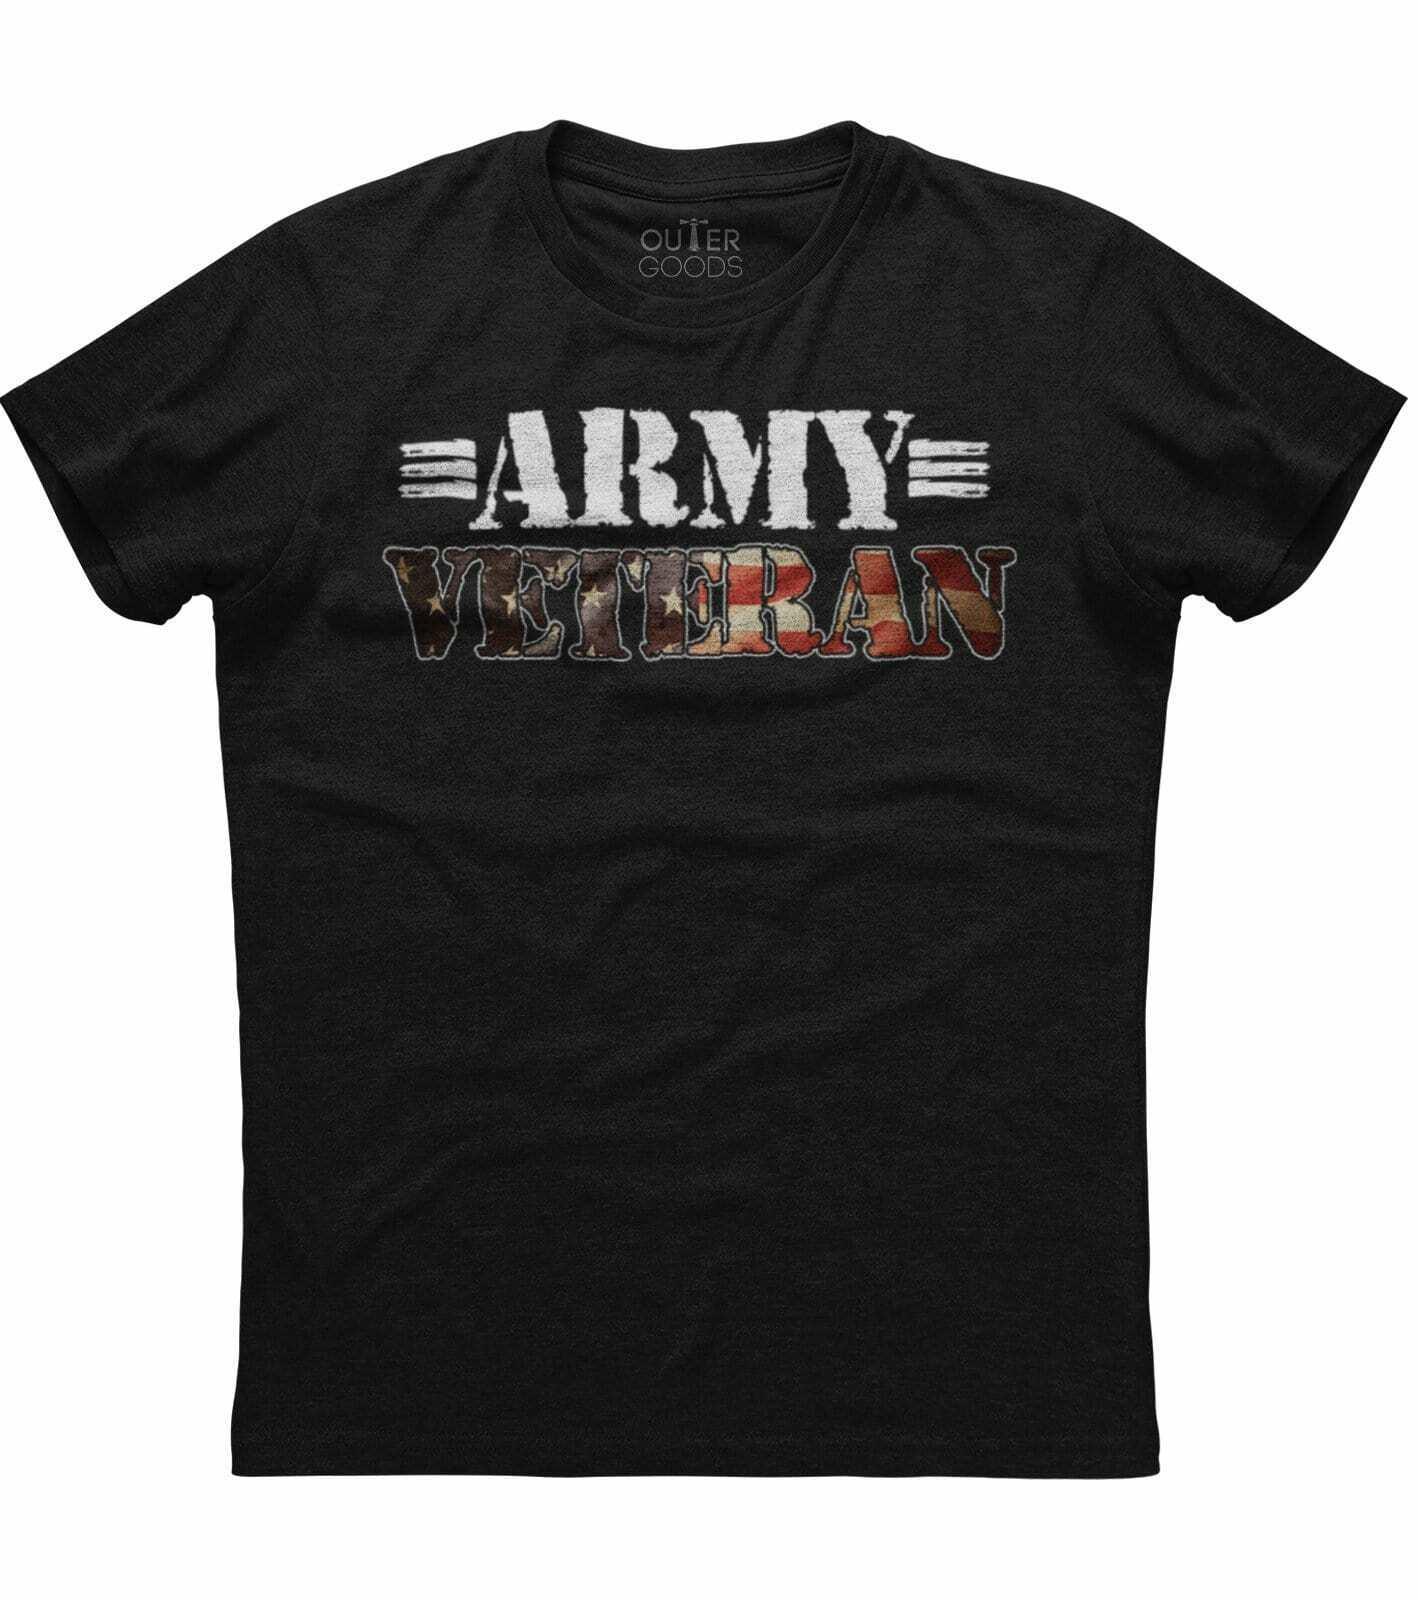 Distressed Print Men'S New Patriotic Trending Black T-Shirt Masswerks Store